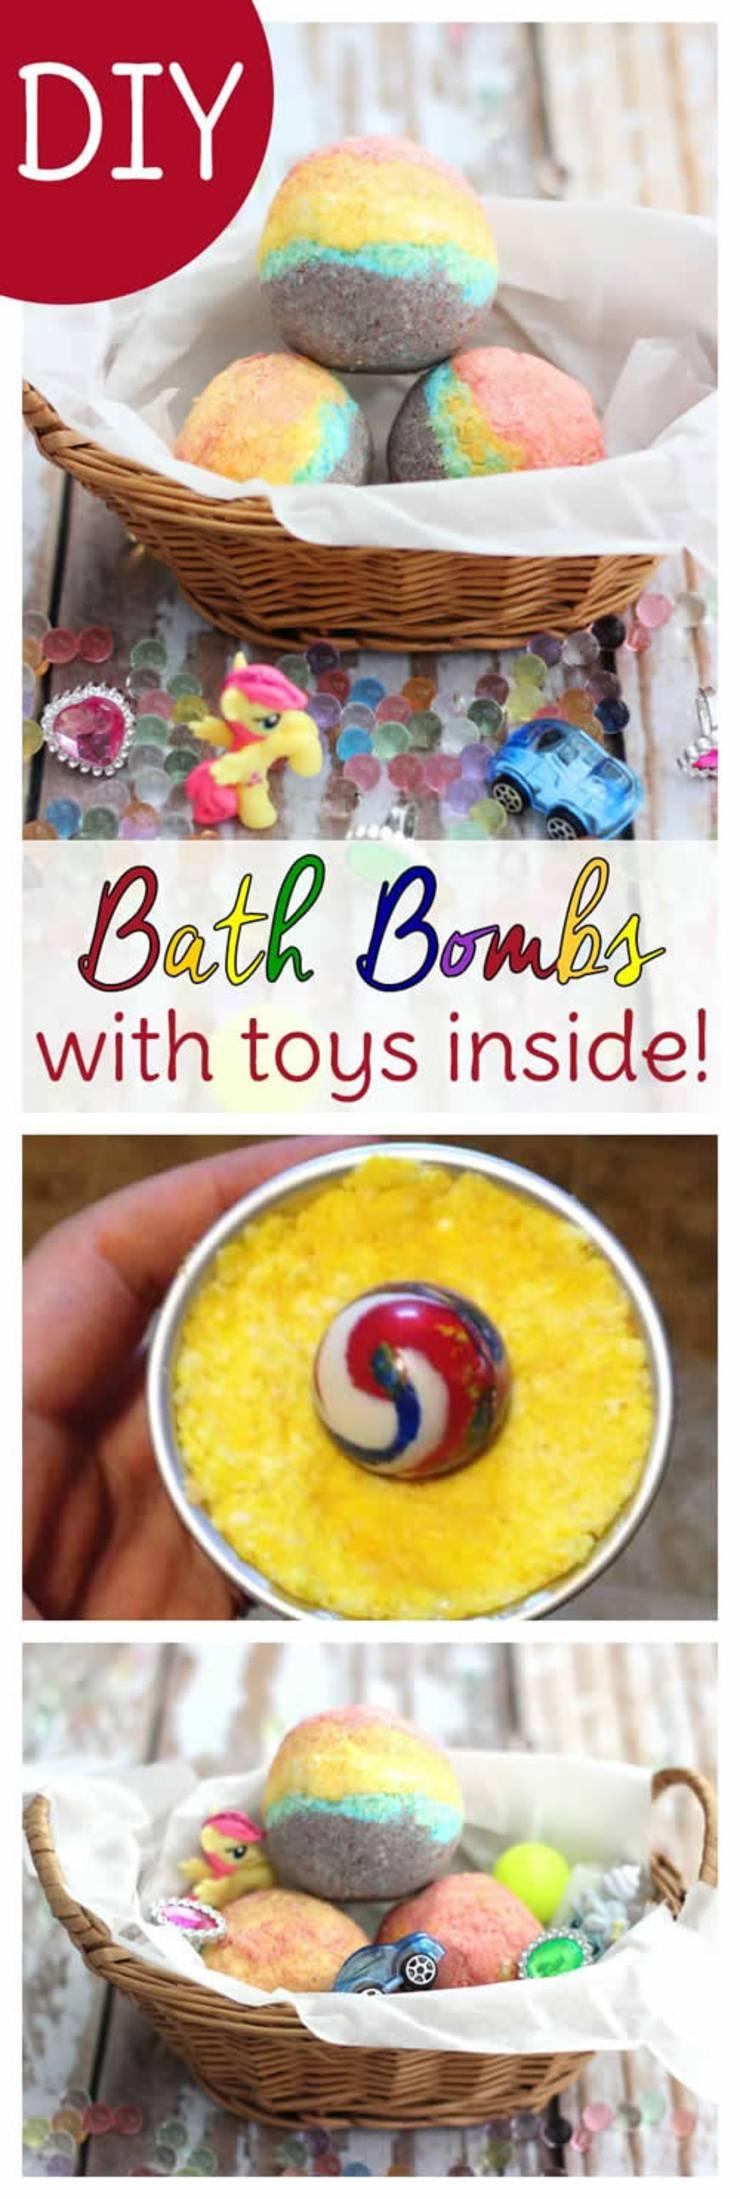 homemade-rainbow-bath-bombs-for-kids